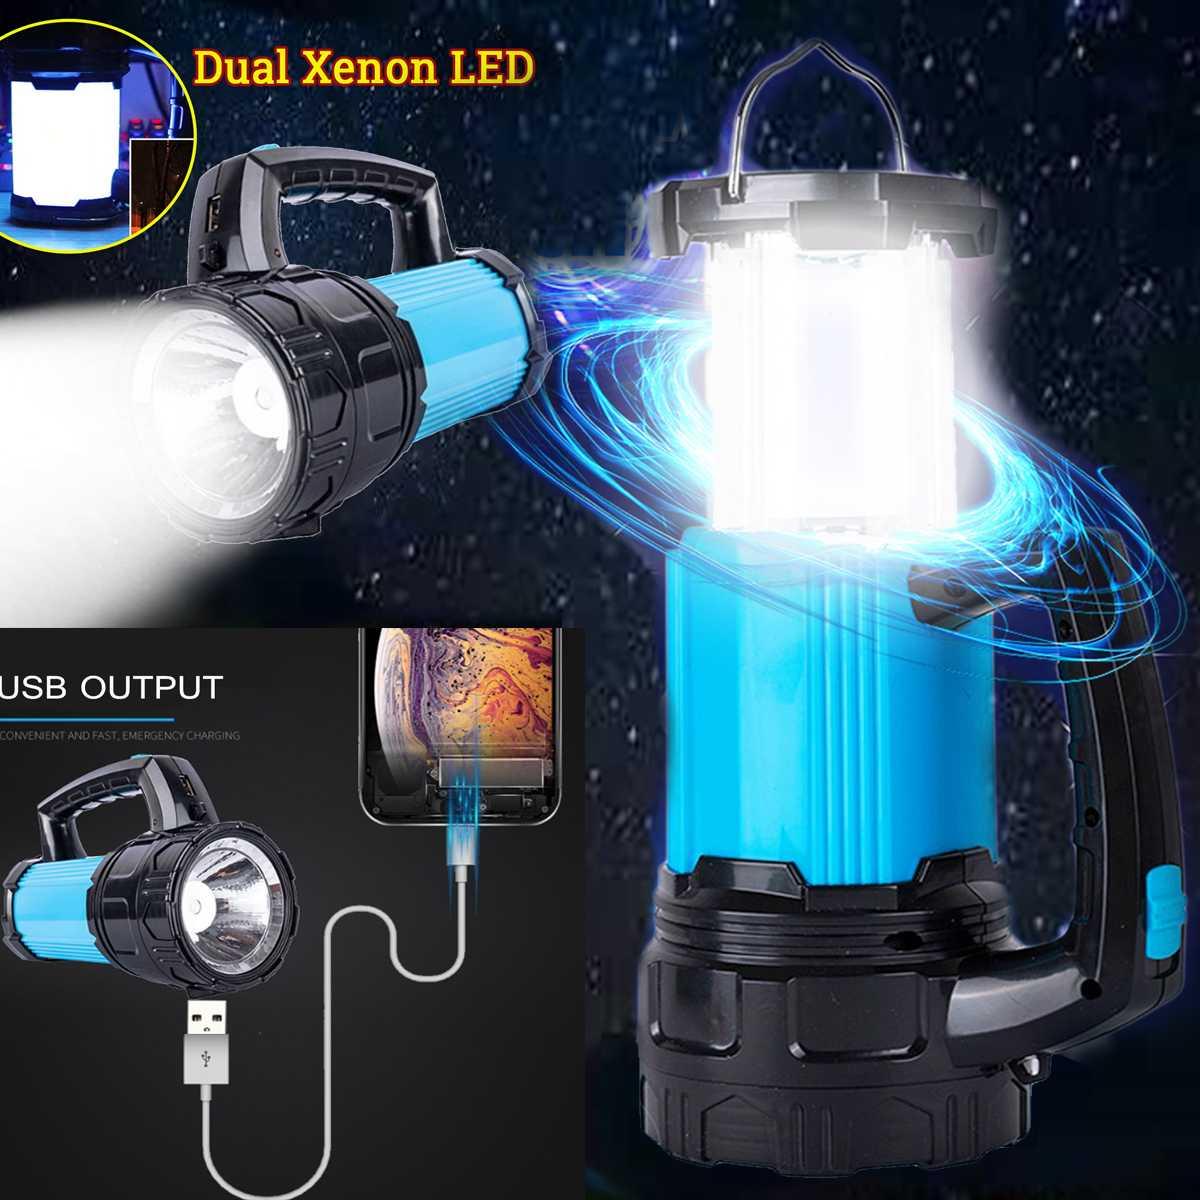 Solar Power Lamp Flashlight USB Port Camping Tent Light Outdoor Portable Hanging Lamp LED Lantern Hiking Emergencies Light